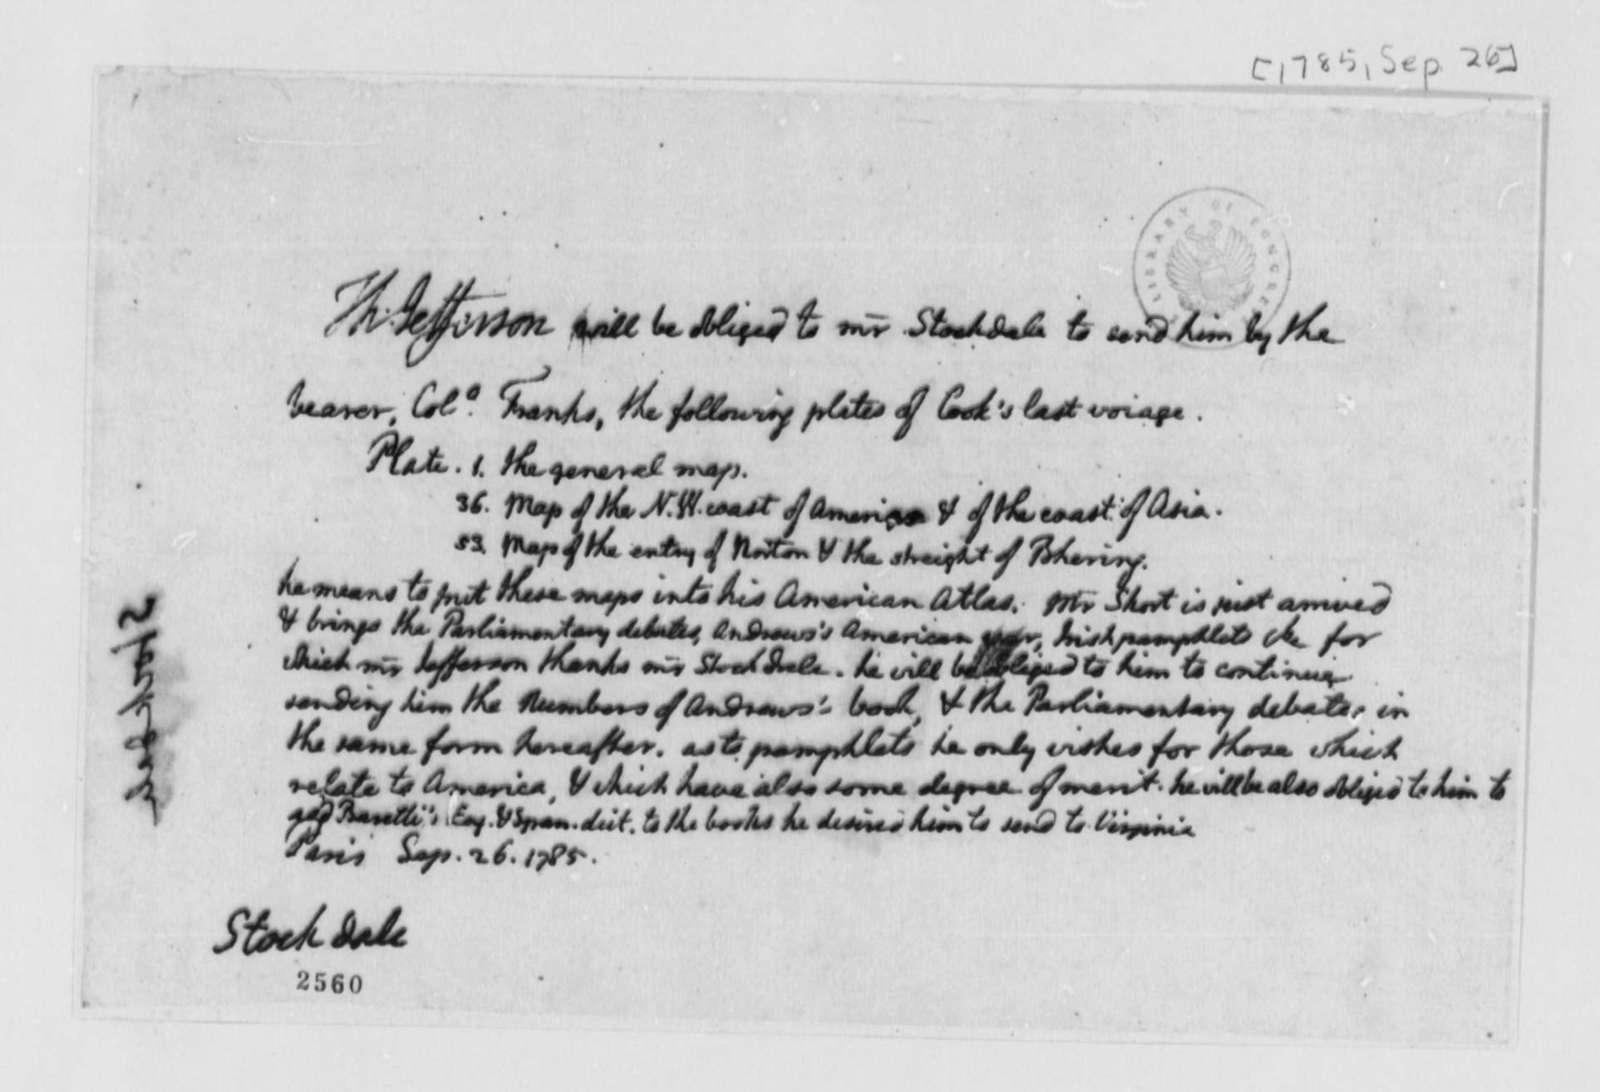 Thomas Jefferson to John Stockdale, September 26, 1785